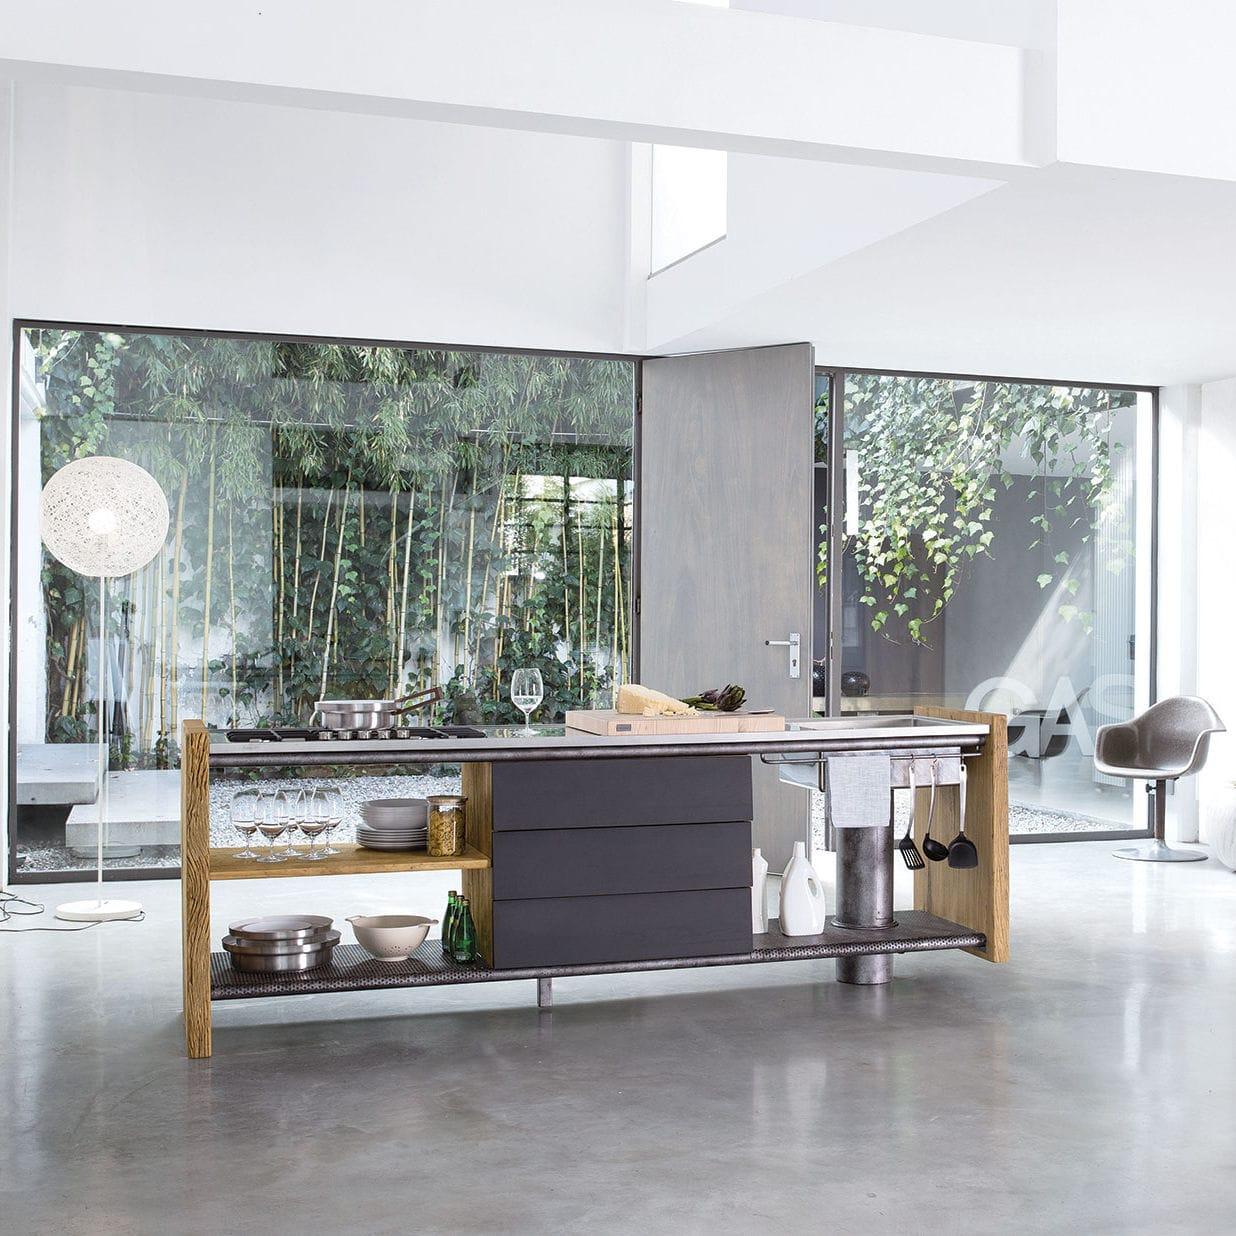 Moderne Küche / Esche / Ulme / Stahl - MONTECRISTO - Nature Design